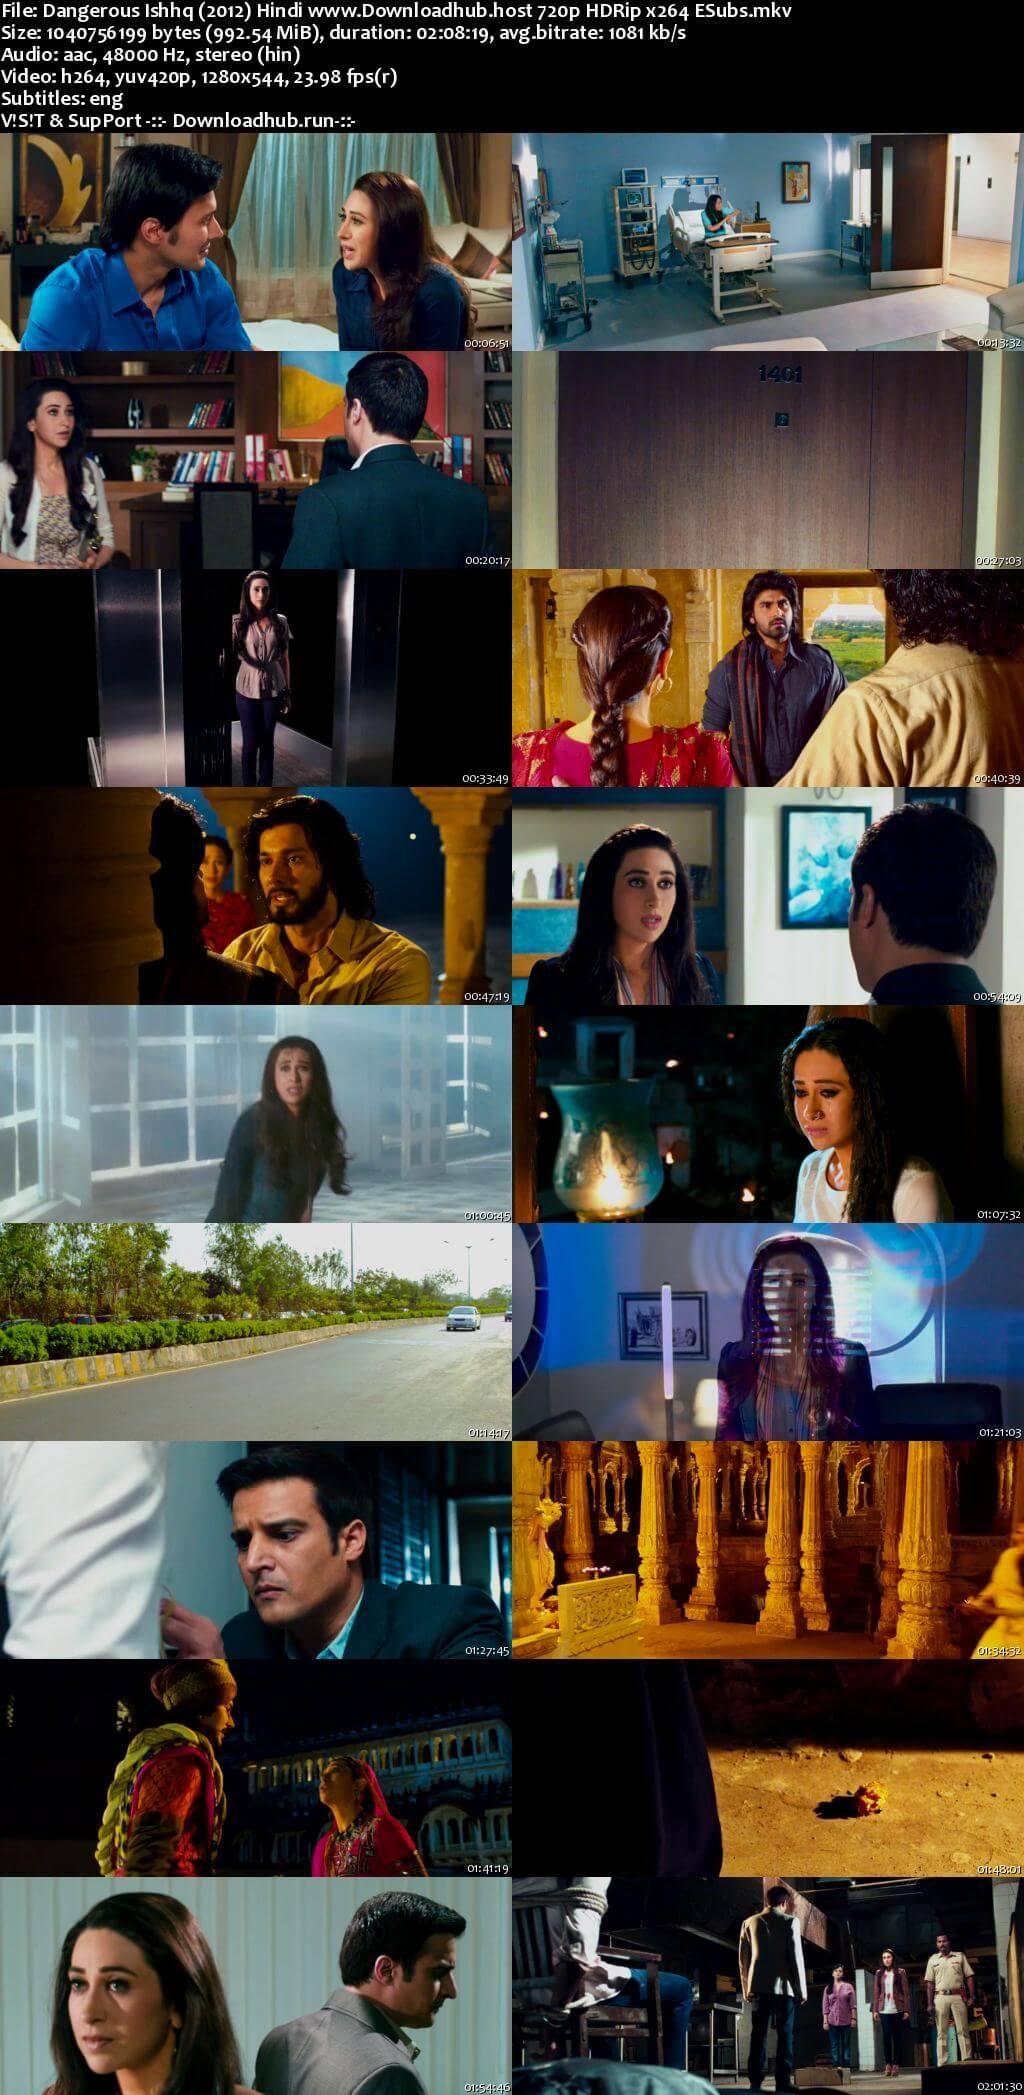 Dangerous Ishhq 2012 Hindi 720p HDRip ESubs